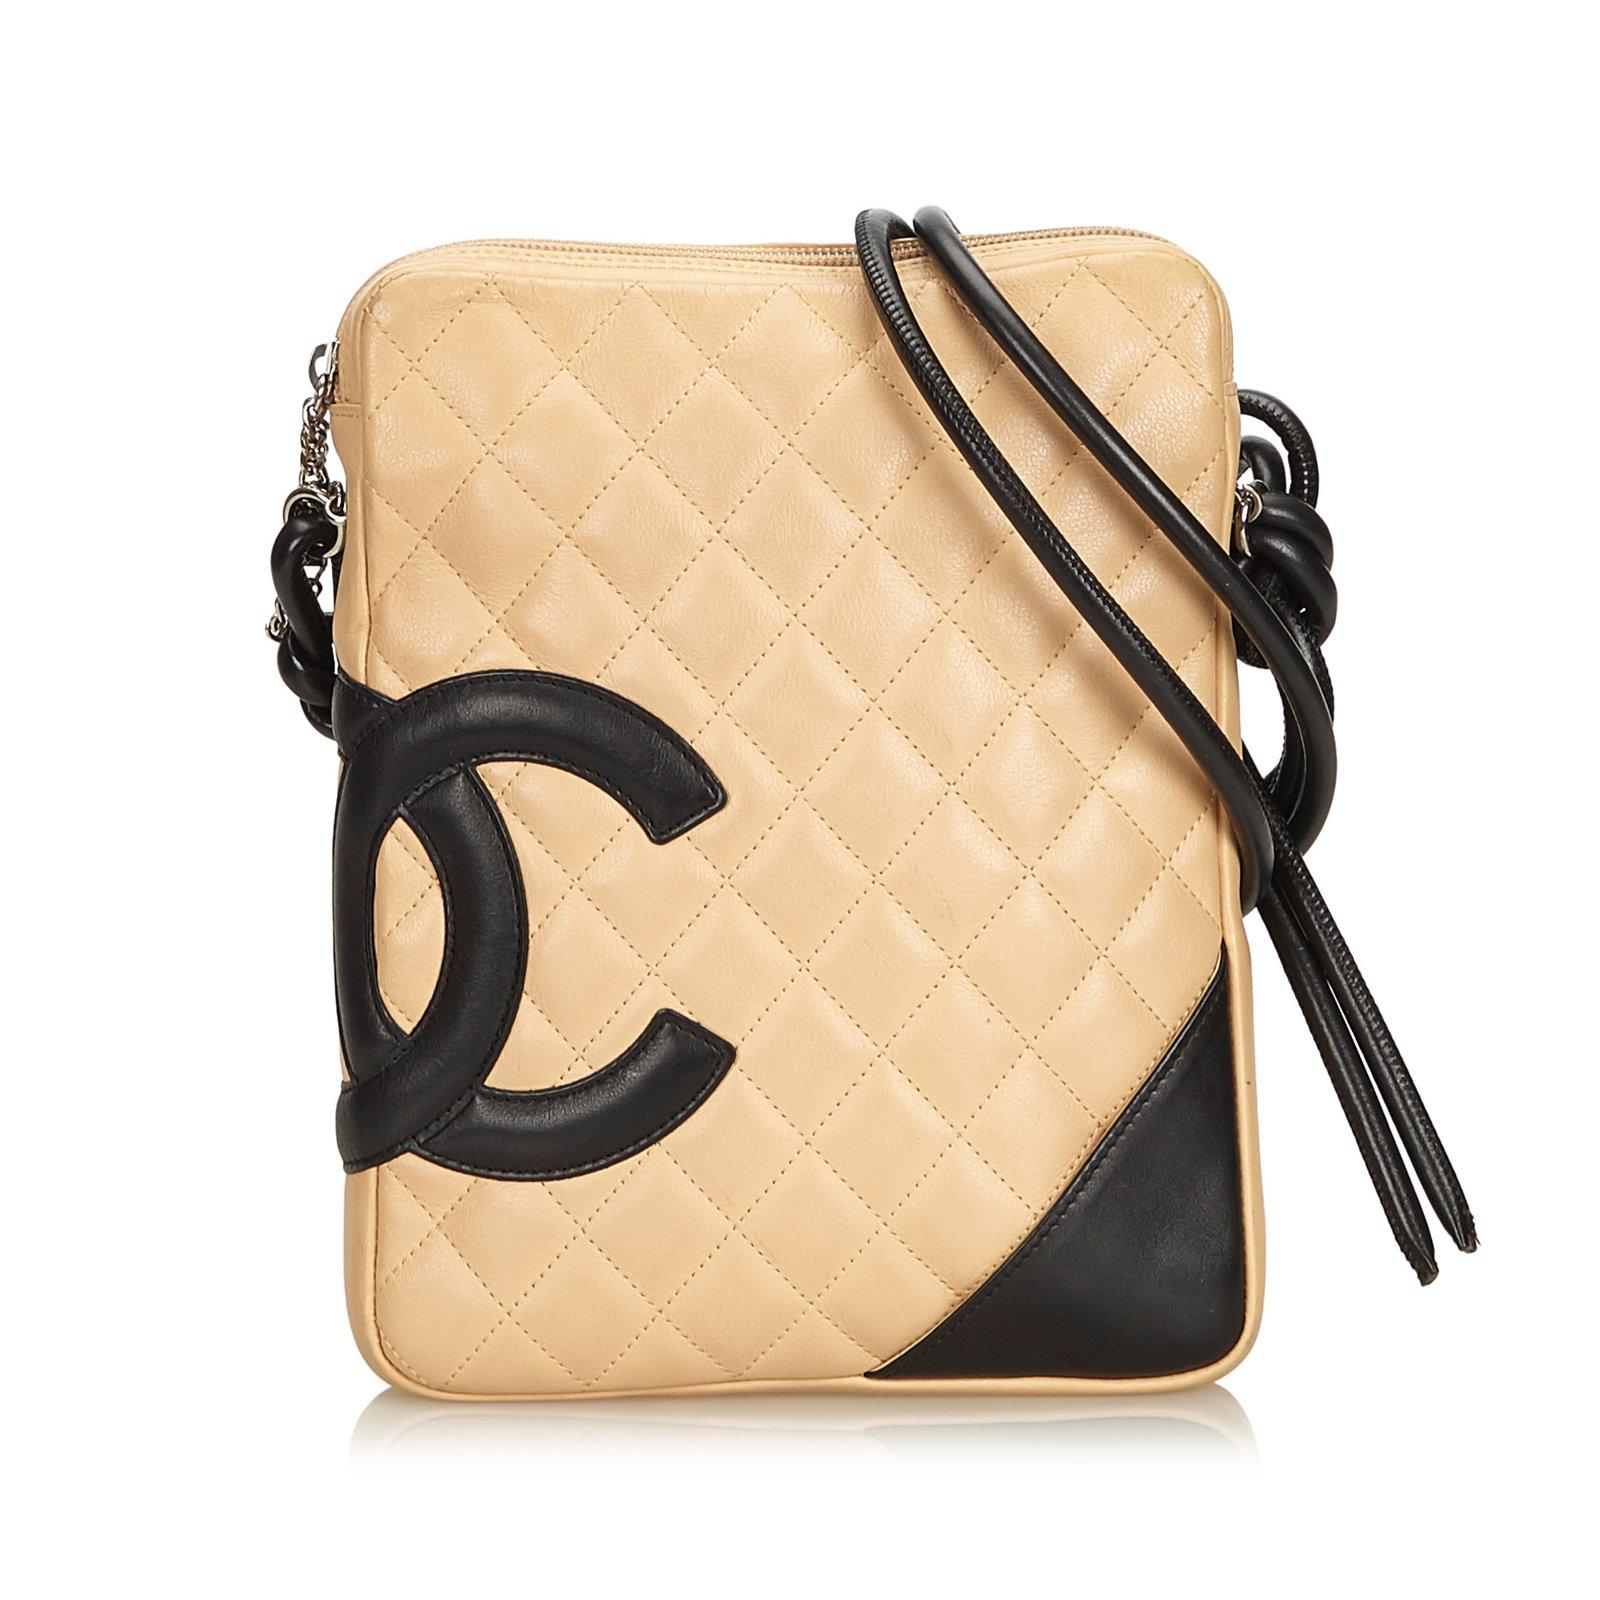 0454ddba350a Sacs à main Chanel Cambon Ligne Crossbody Bag Cuir Marron,Noir,Beige ref.